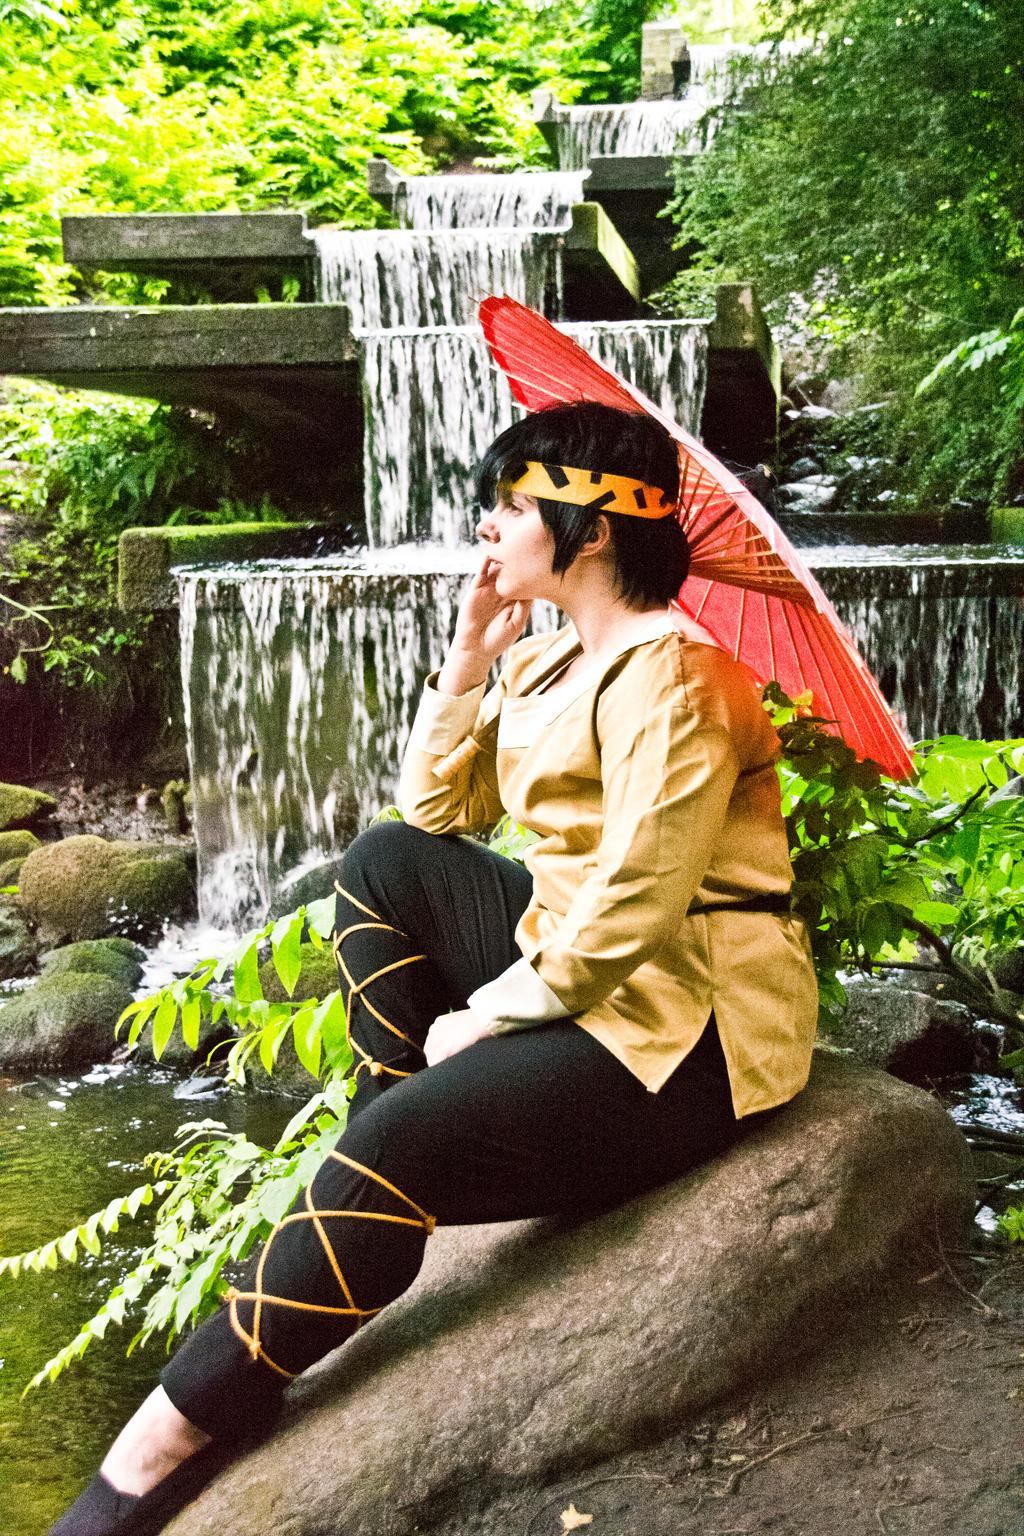 Tropical Oasis by Miha-ru on DeviantArt